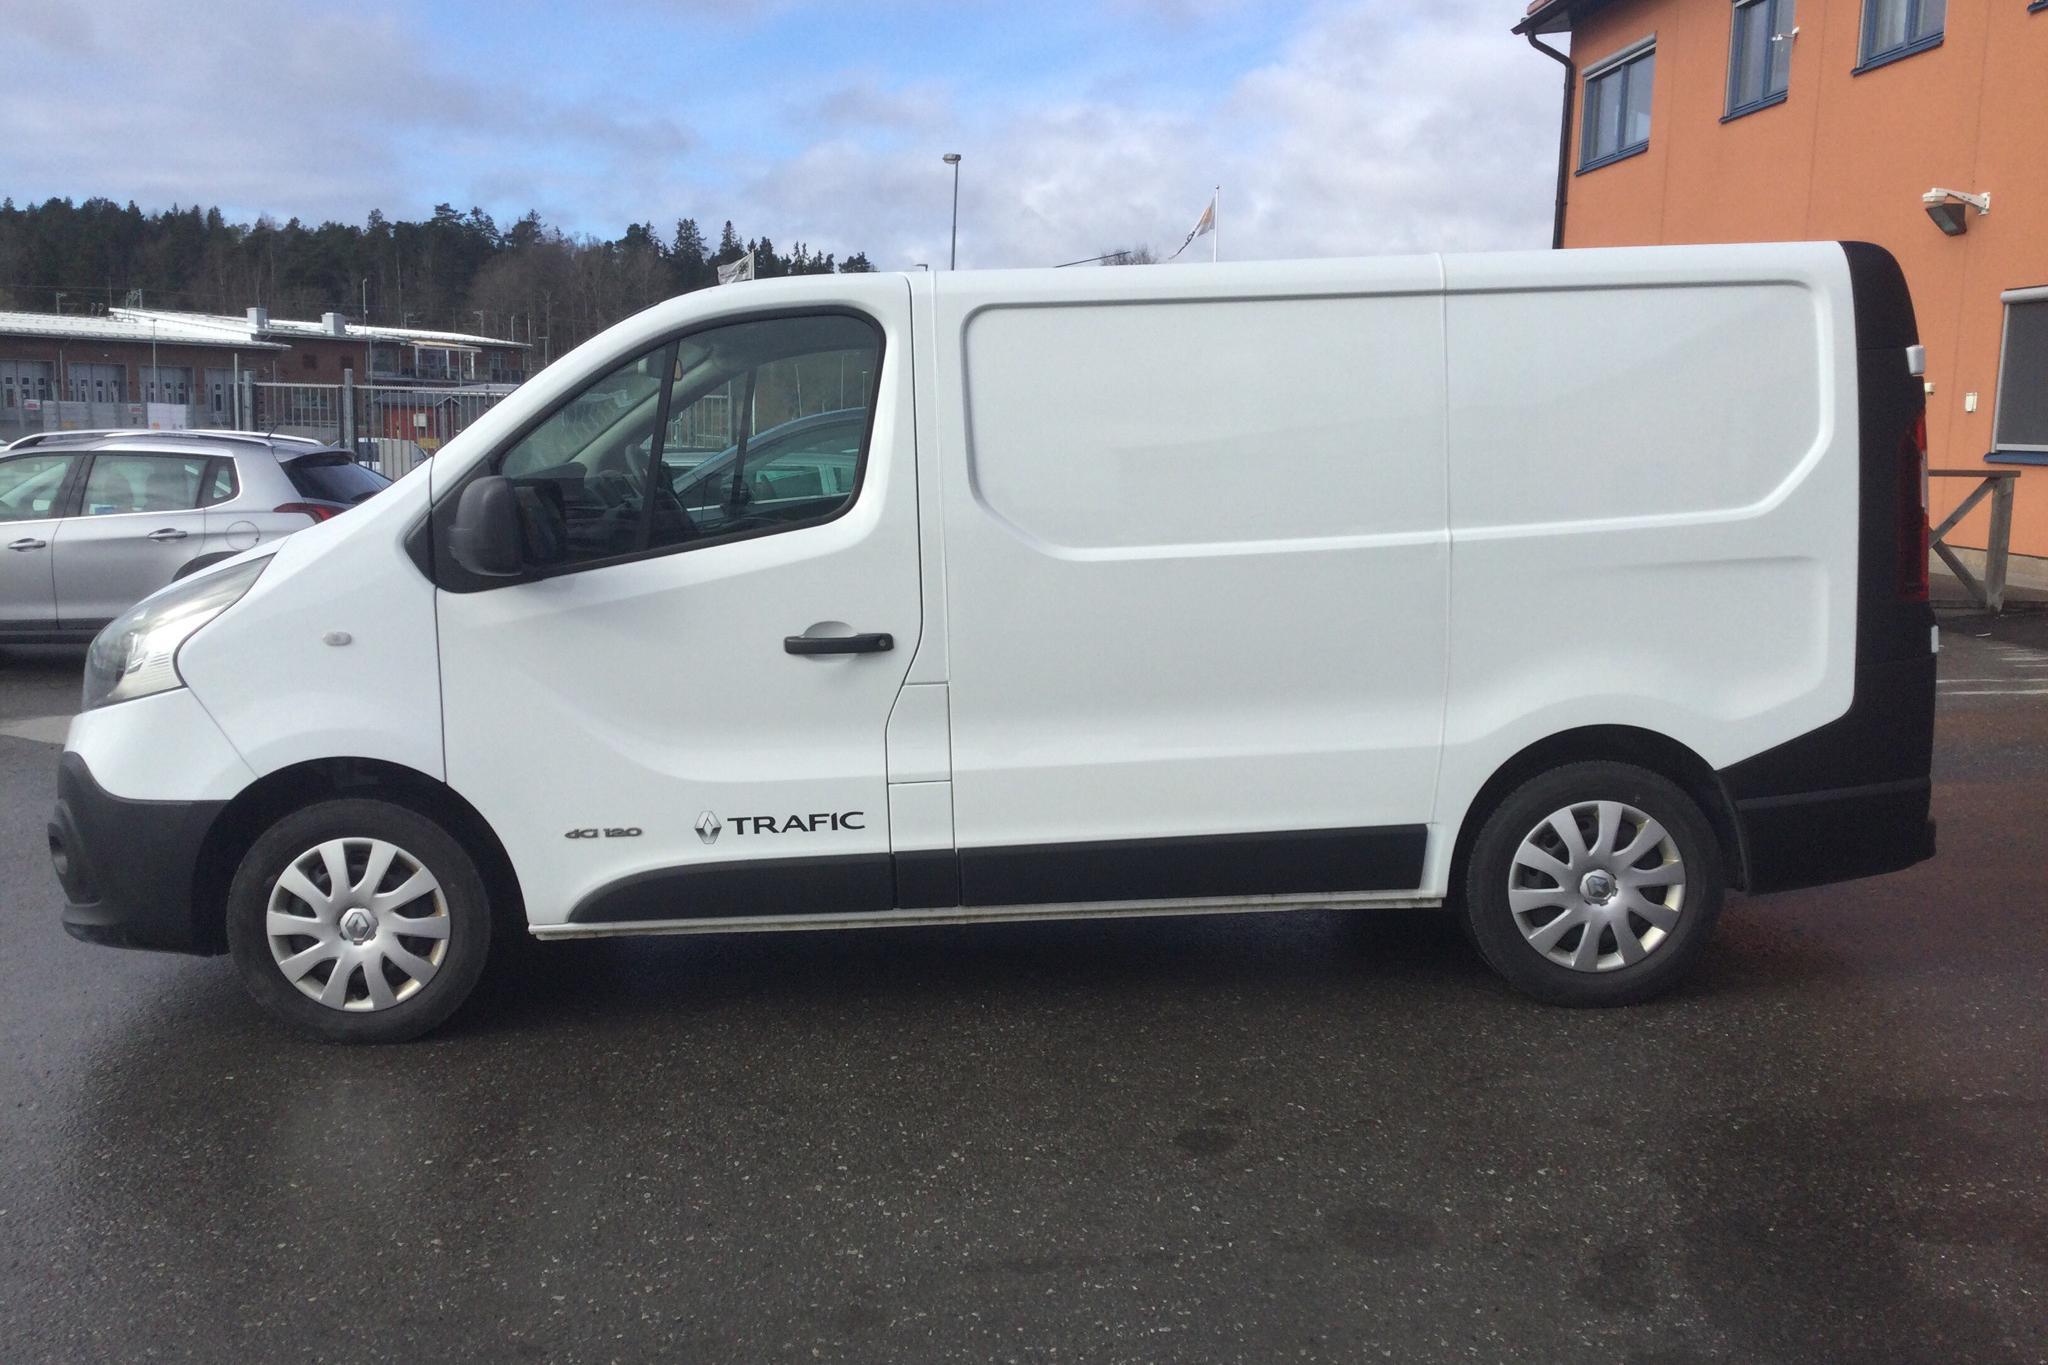 Renault Trafic 1.6 dCi Skåp (120hk) - 9 907 mil - Manuell - vit - 2017